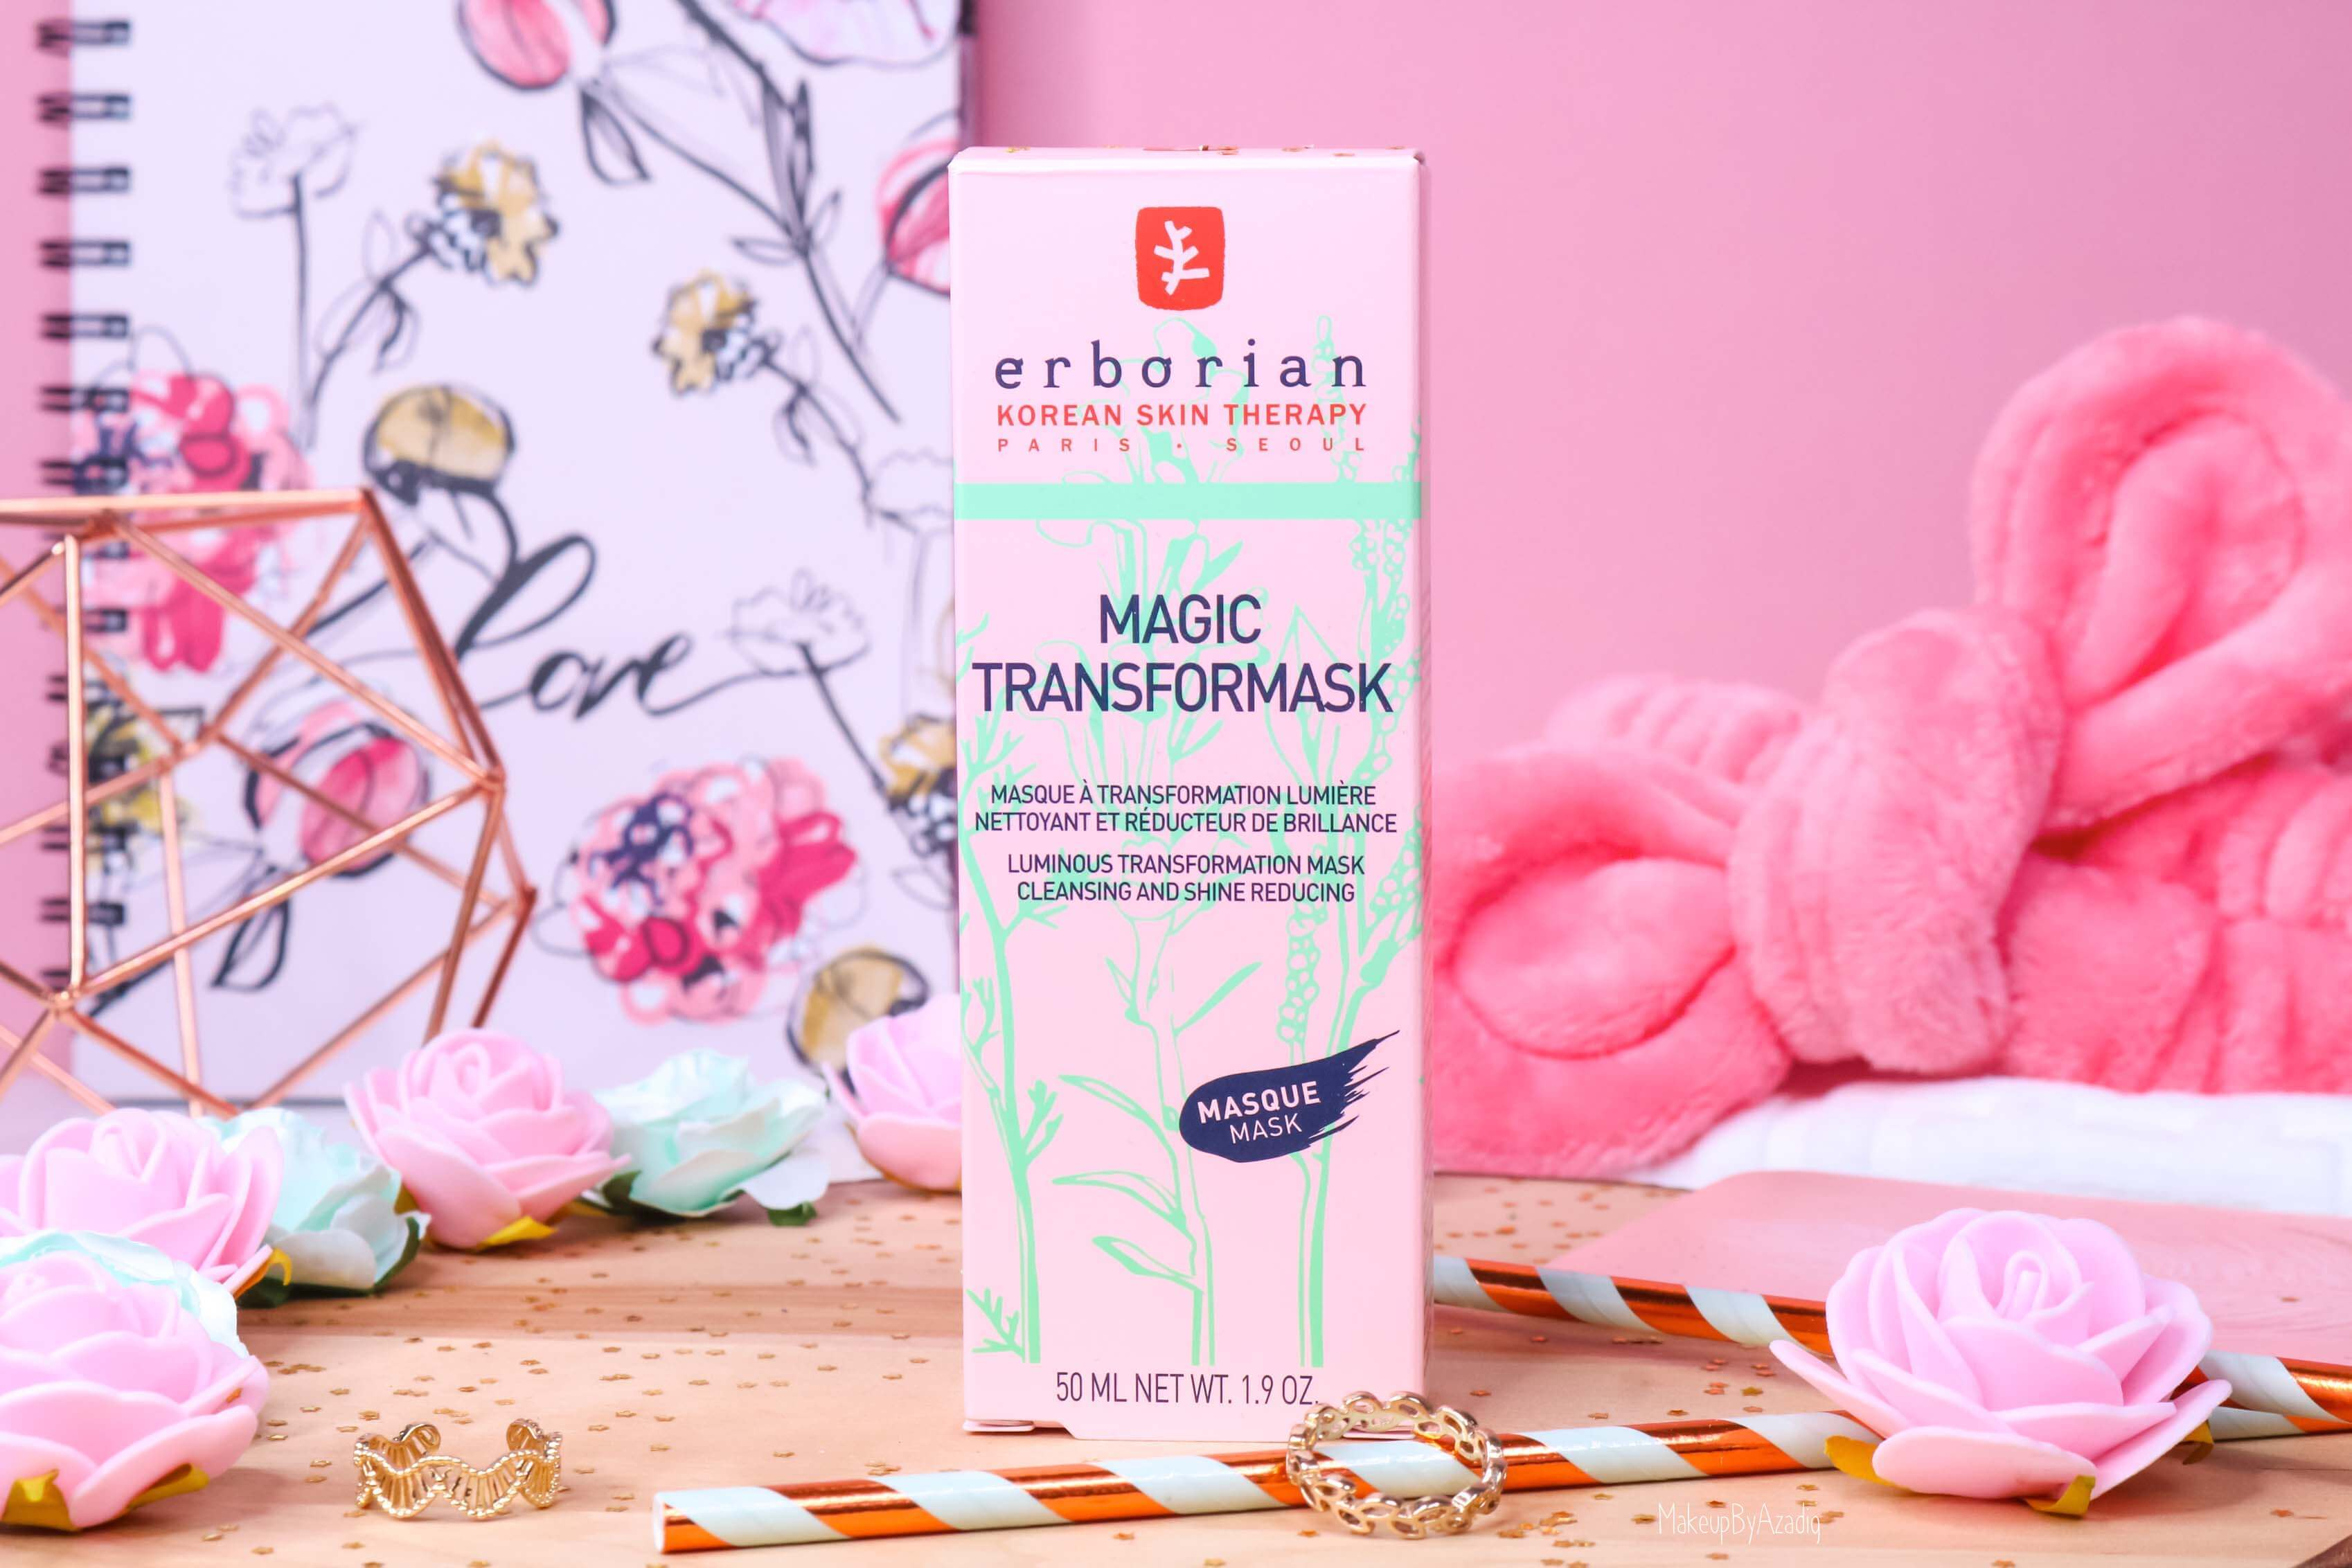 revue-magic-transformask-erborian-masque-visage-rose-sephora-avis-prix-makeupbyazadig-korean-packaging